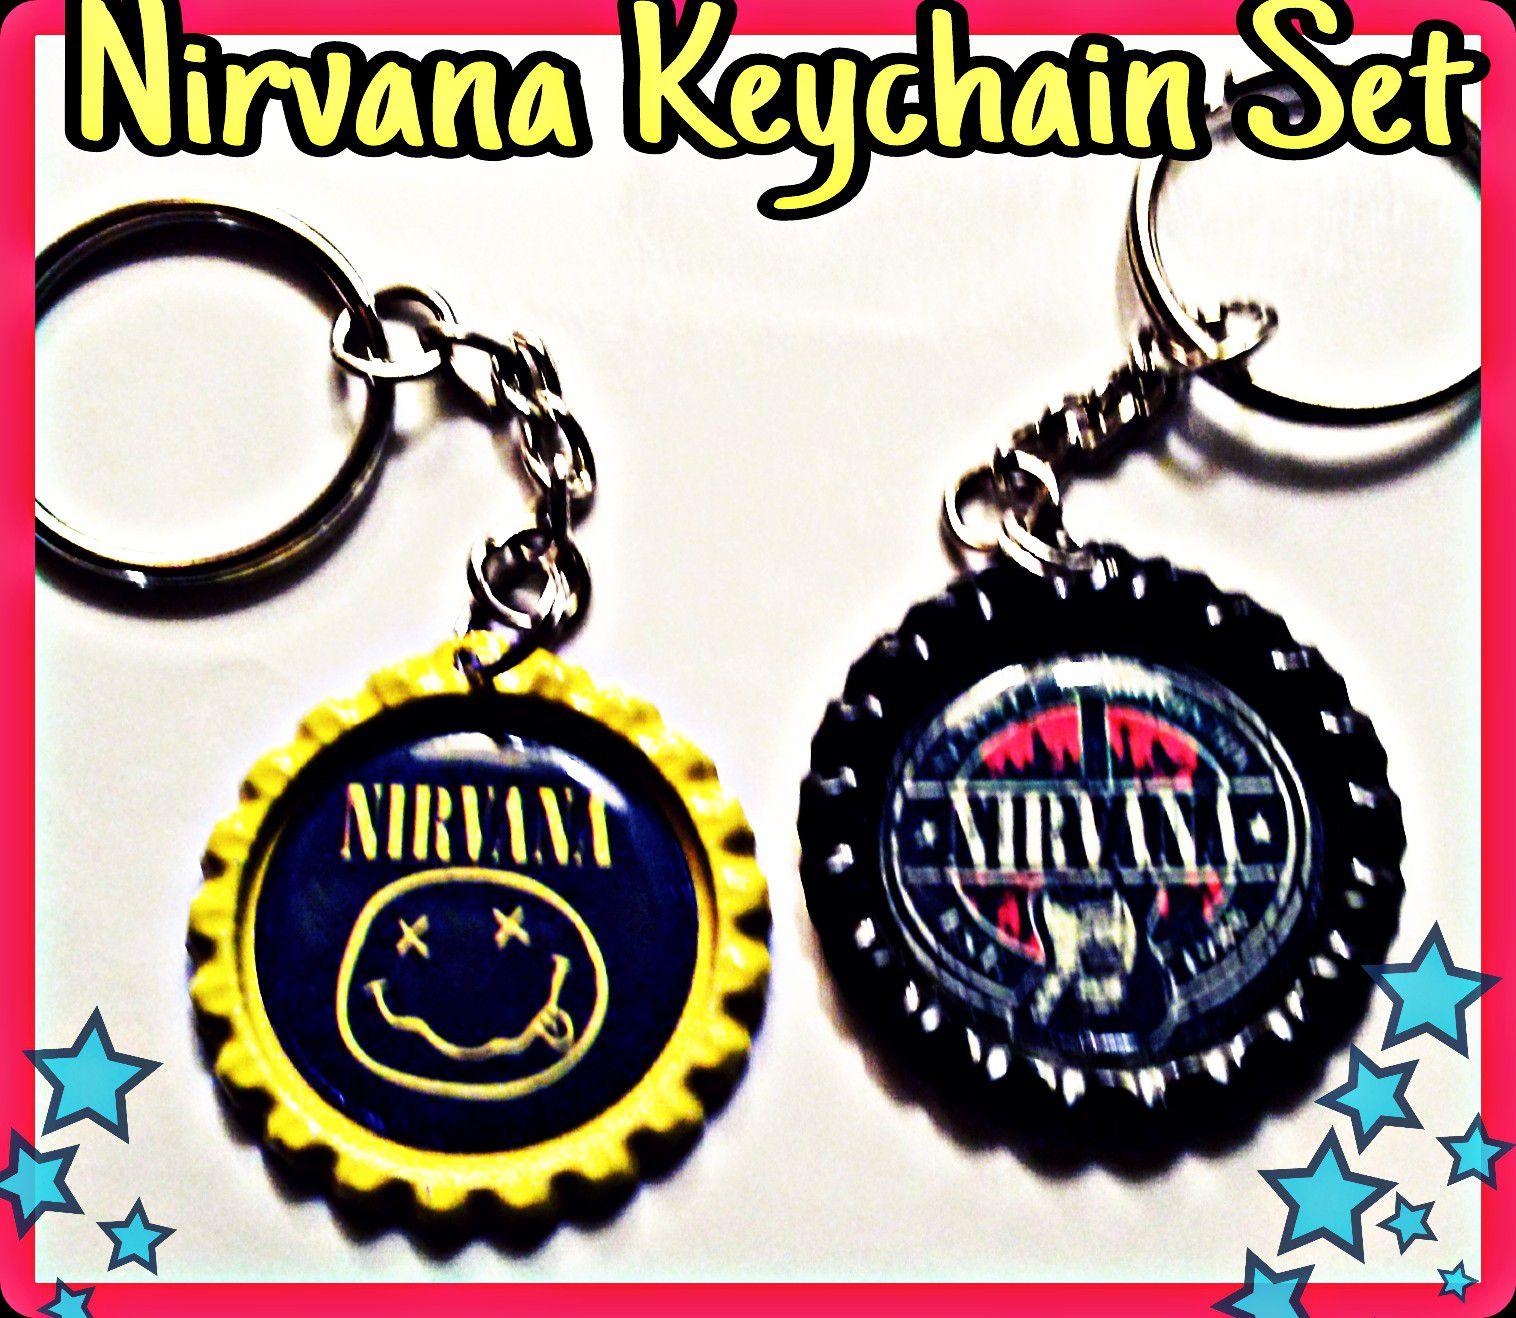 Nirvana Inspired handmade keychain set